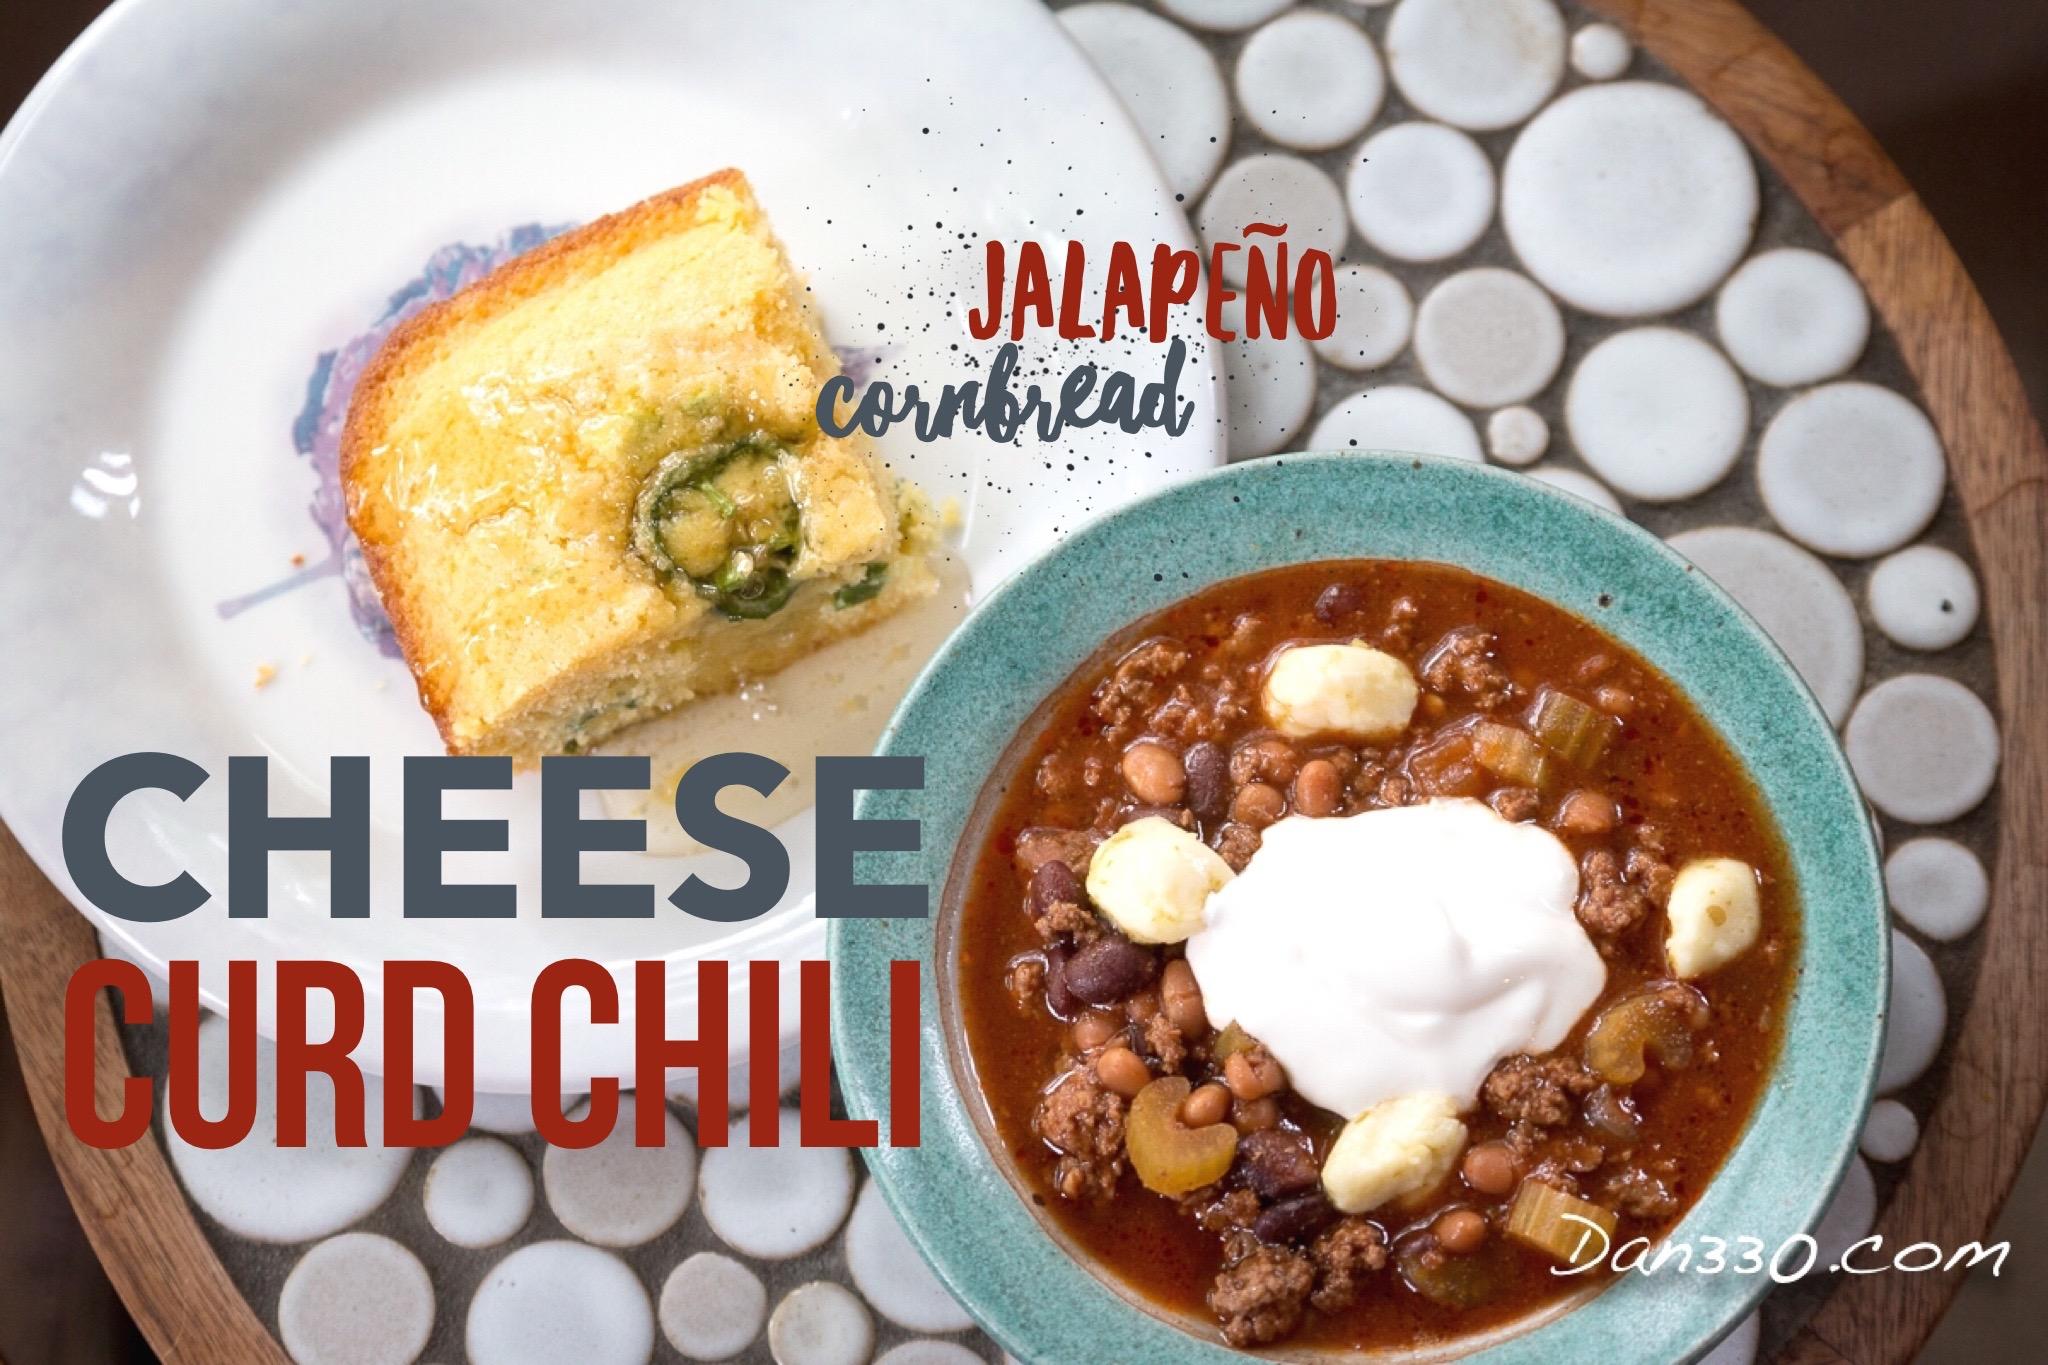 Cheese Curd Chili